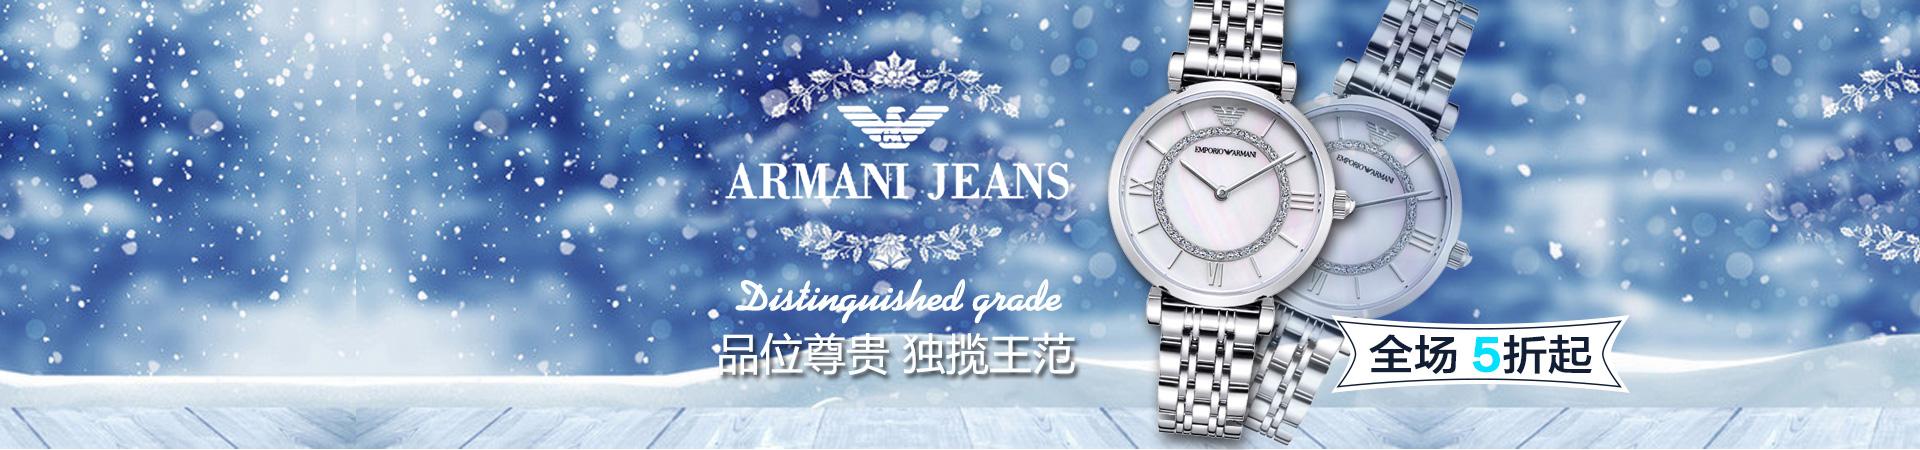 Armani阿玛尼品牌特价专场